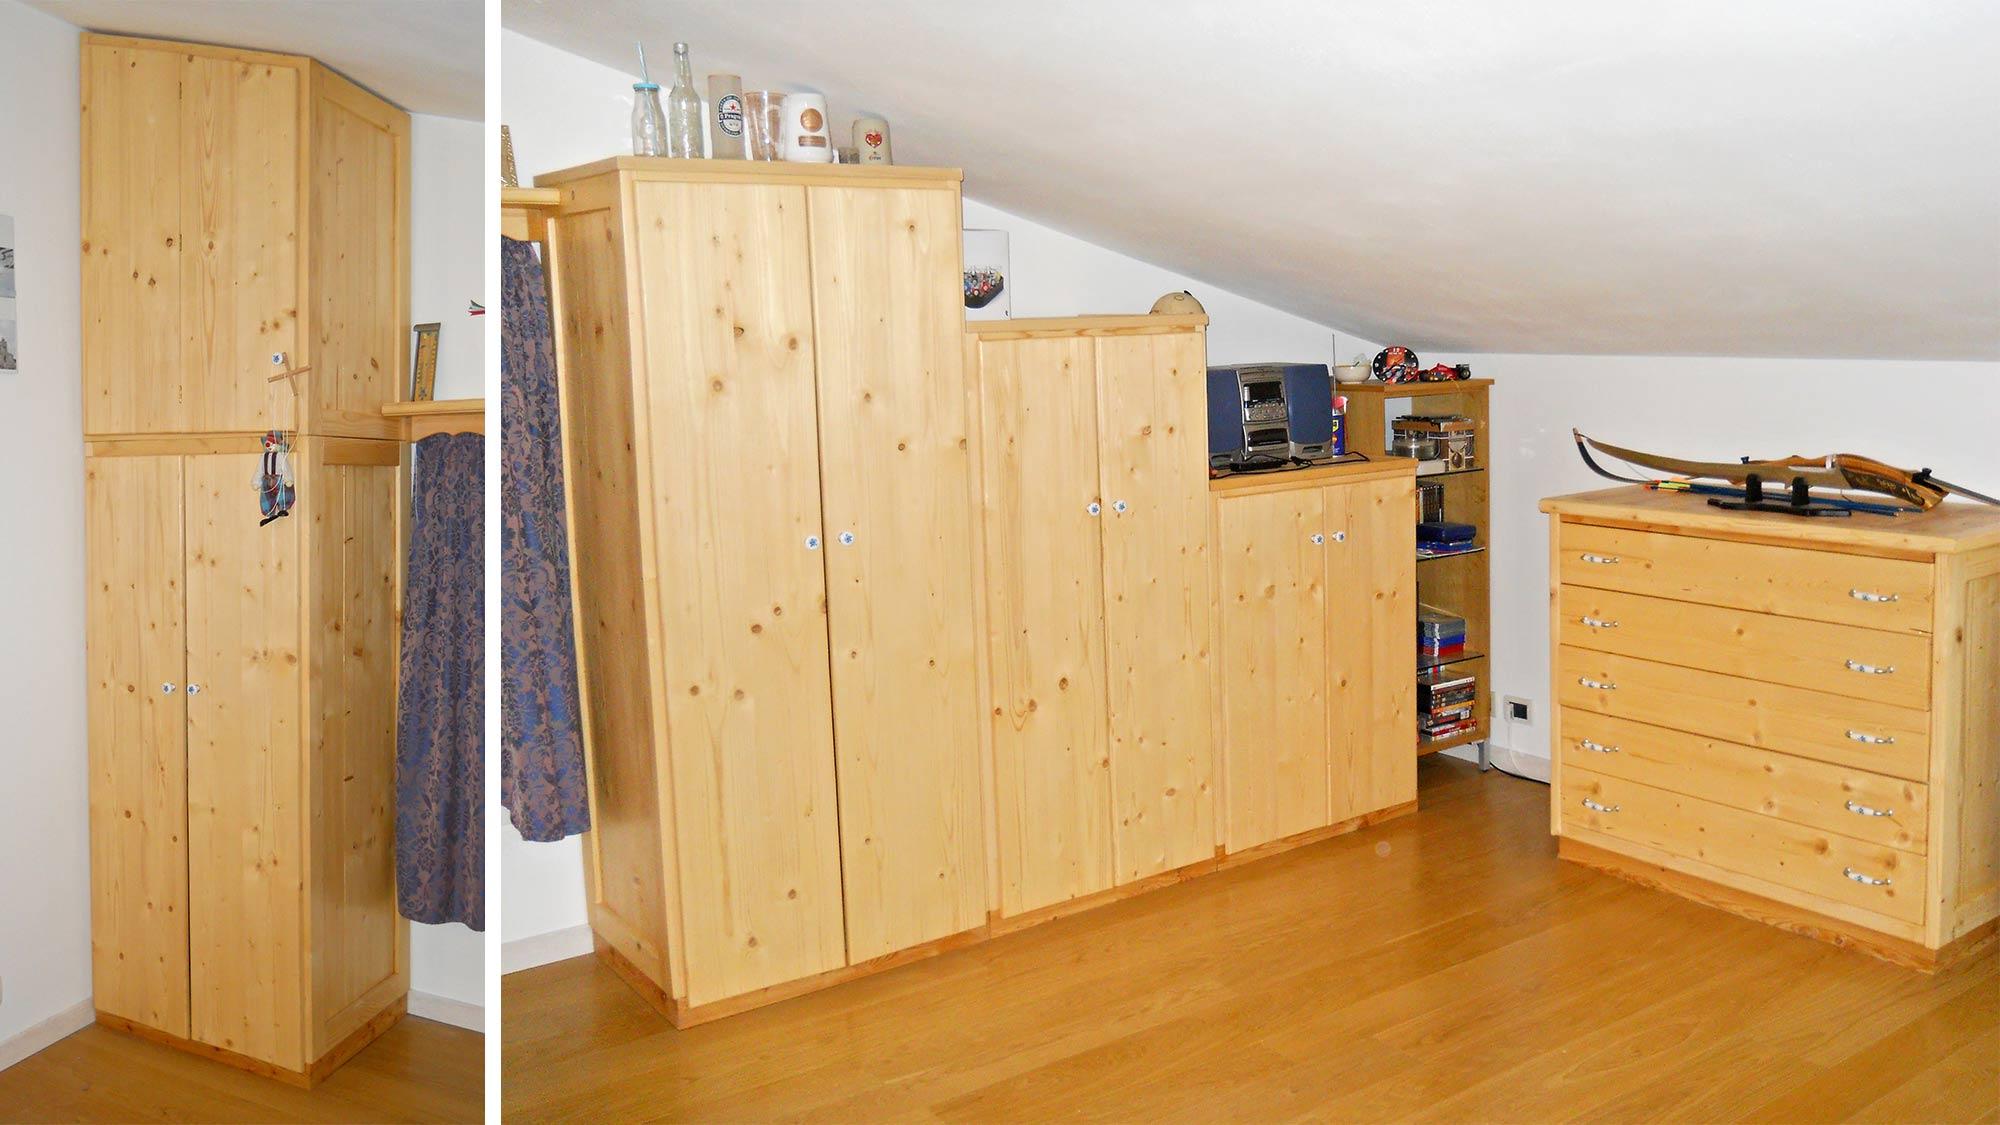 Mobili per mansarda in legno | Costruzione fai da te